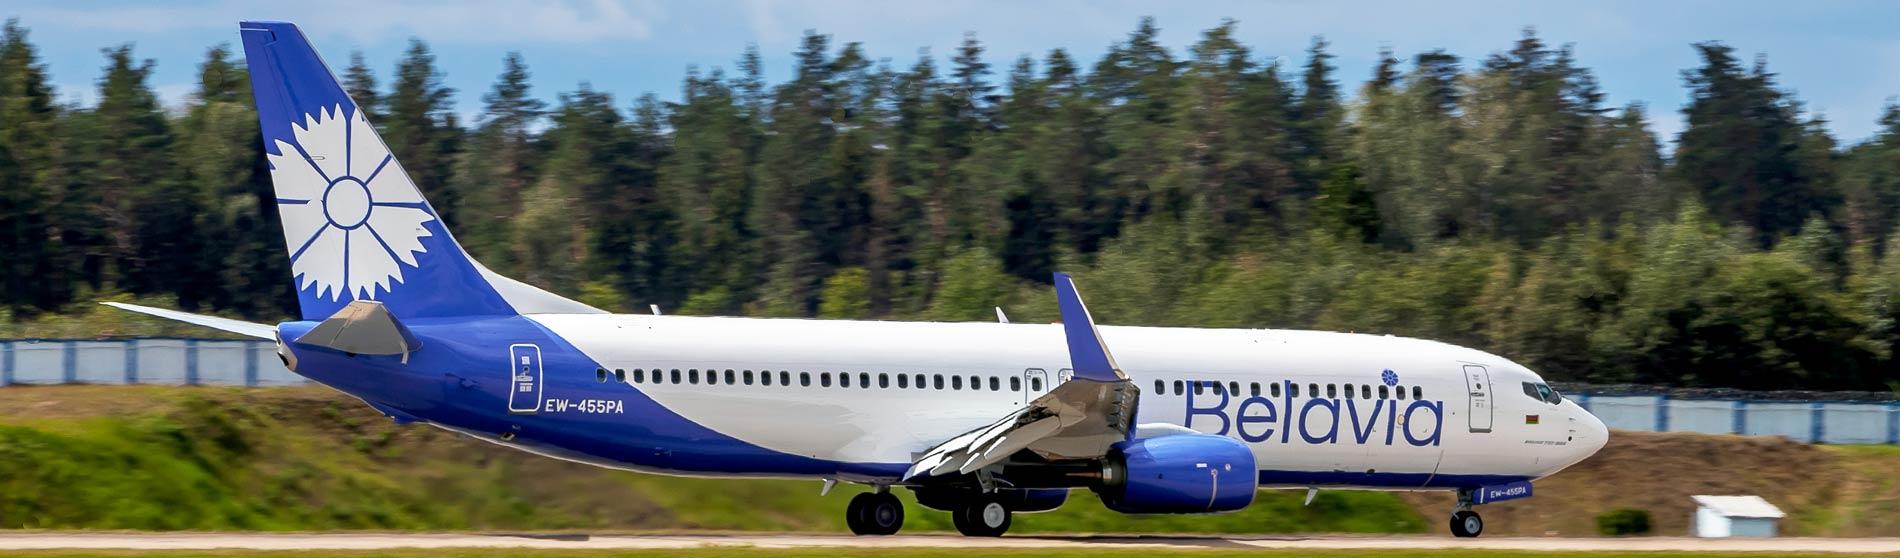 Купить авиабилеты астана-минск белавиа билеты на самолет нижнекамск-москва